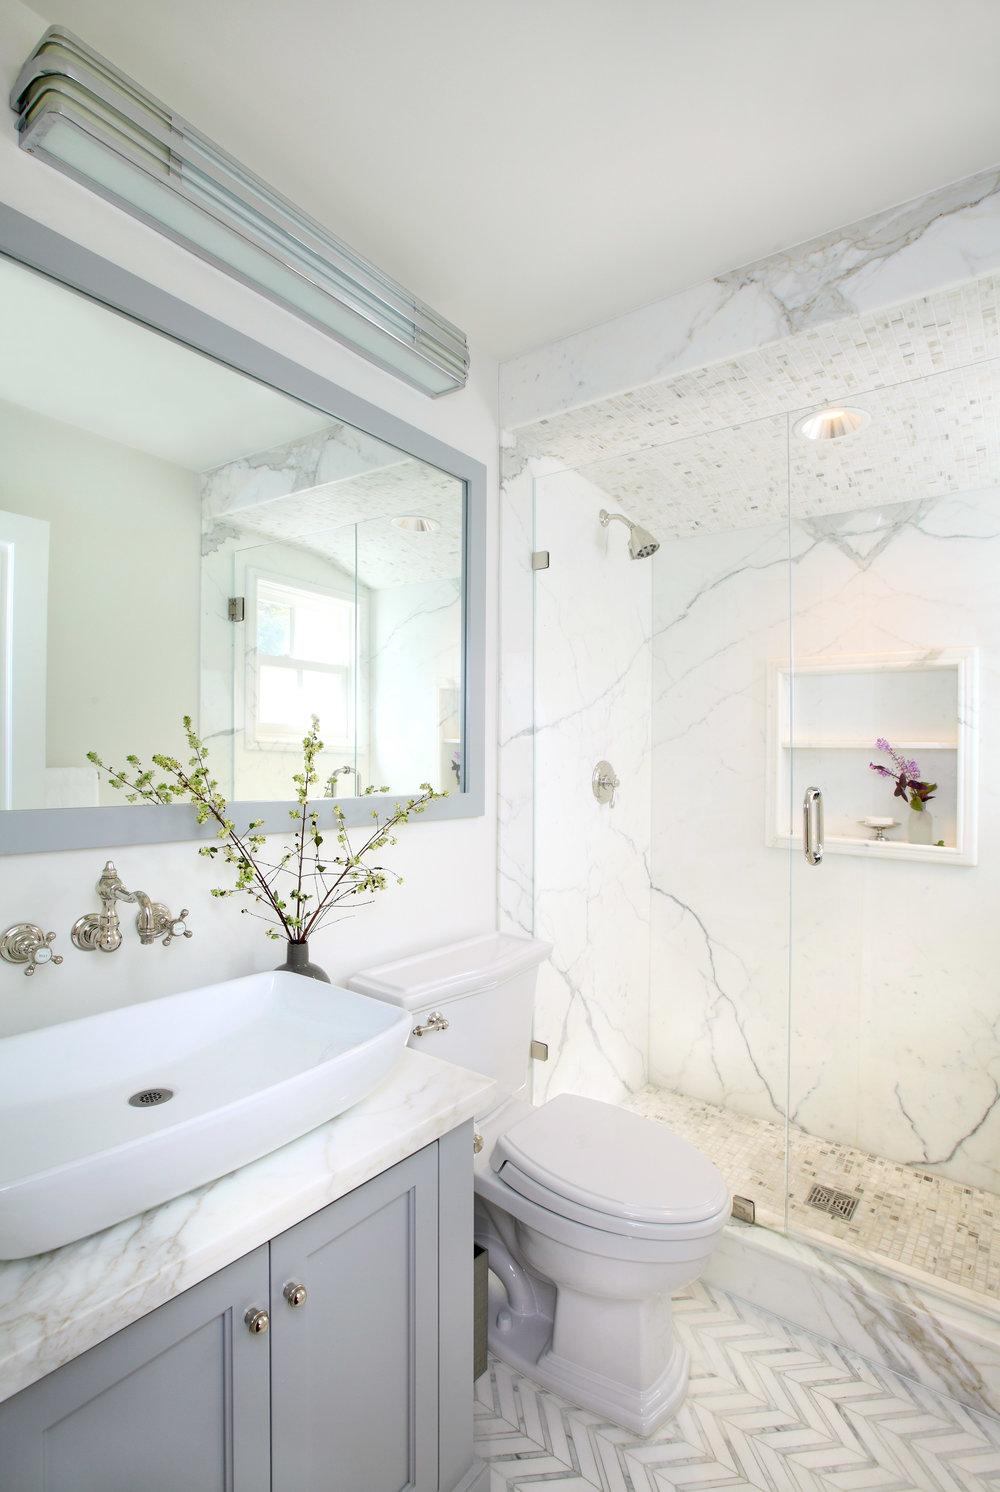 Sarah Barnard Design - Traditional Home: Luxury Calacatta Gold ...